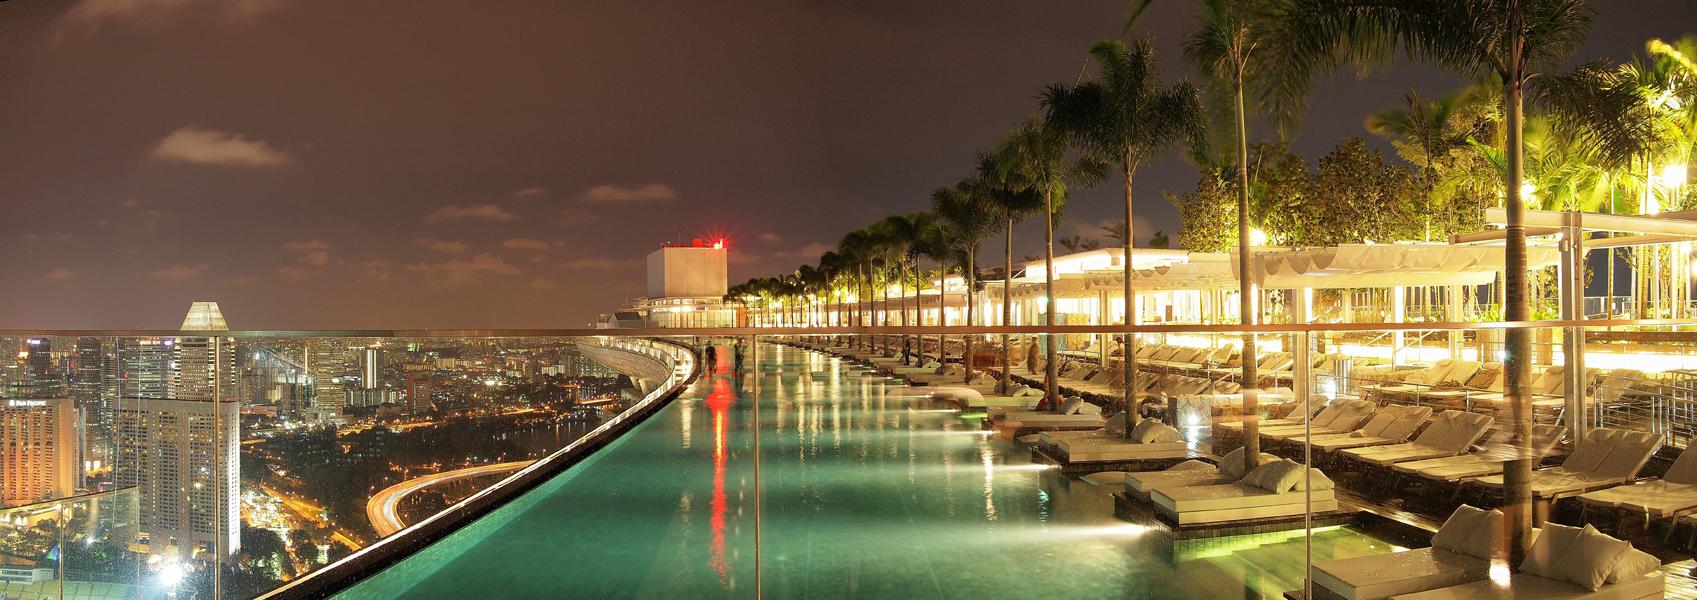 марина бей сингапур бассейн на крыше фото байкам спавнятся